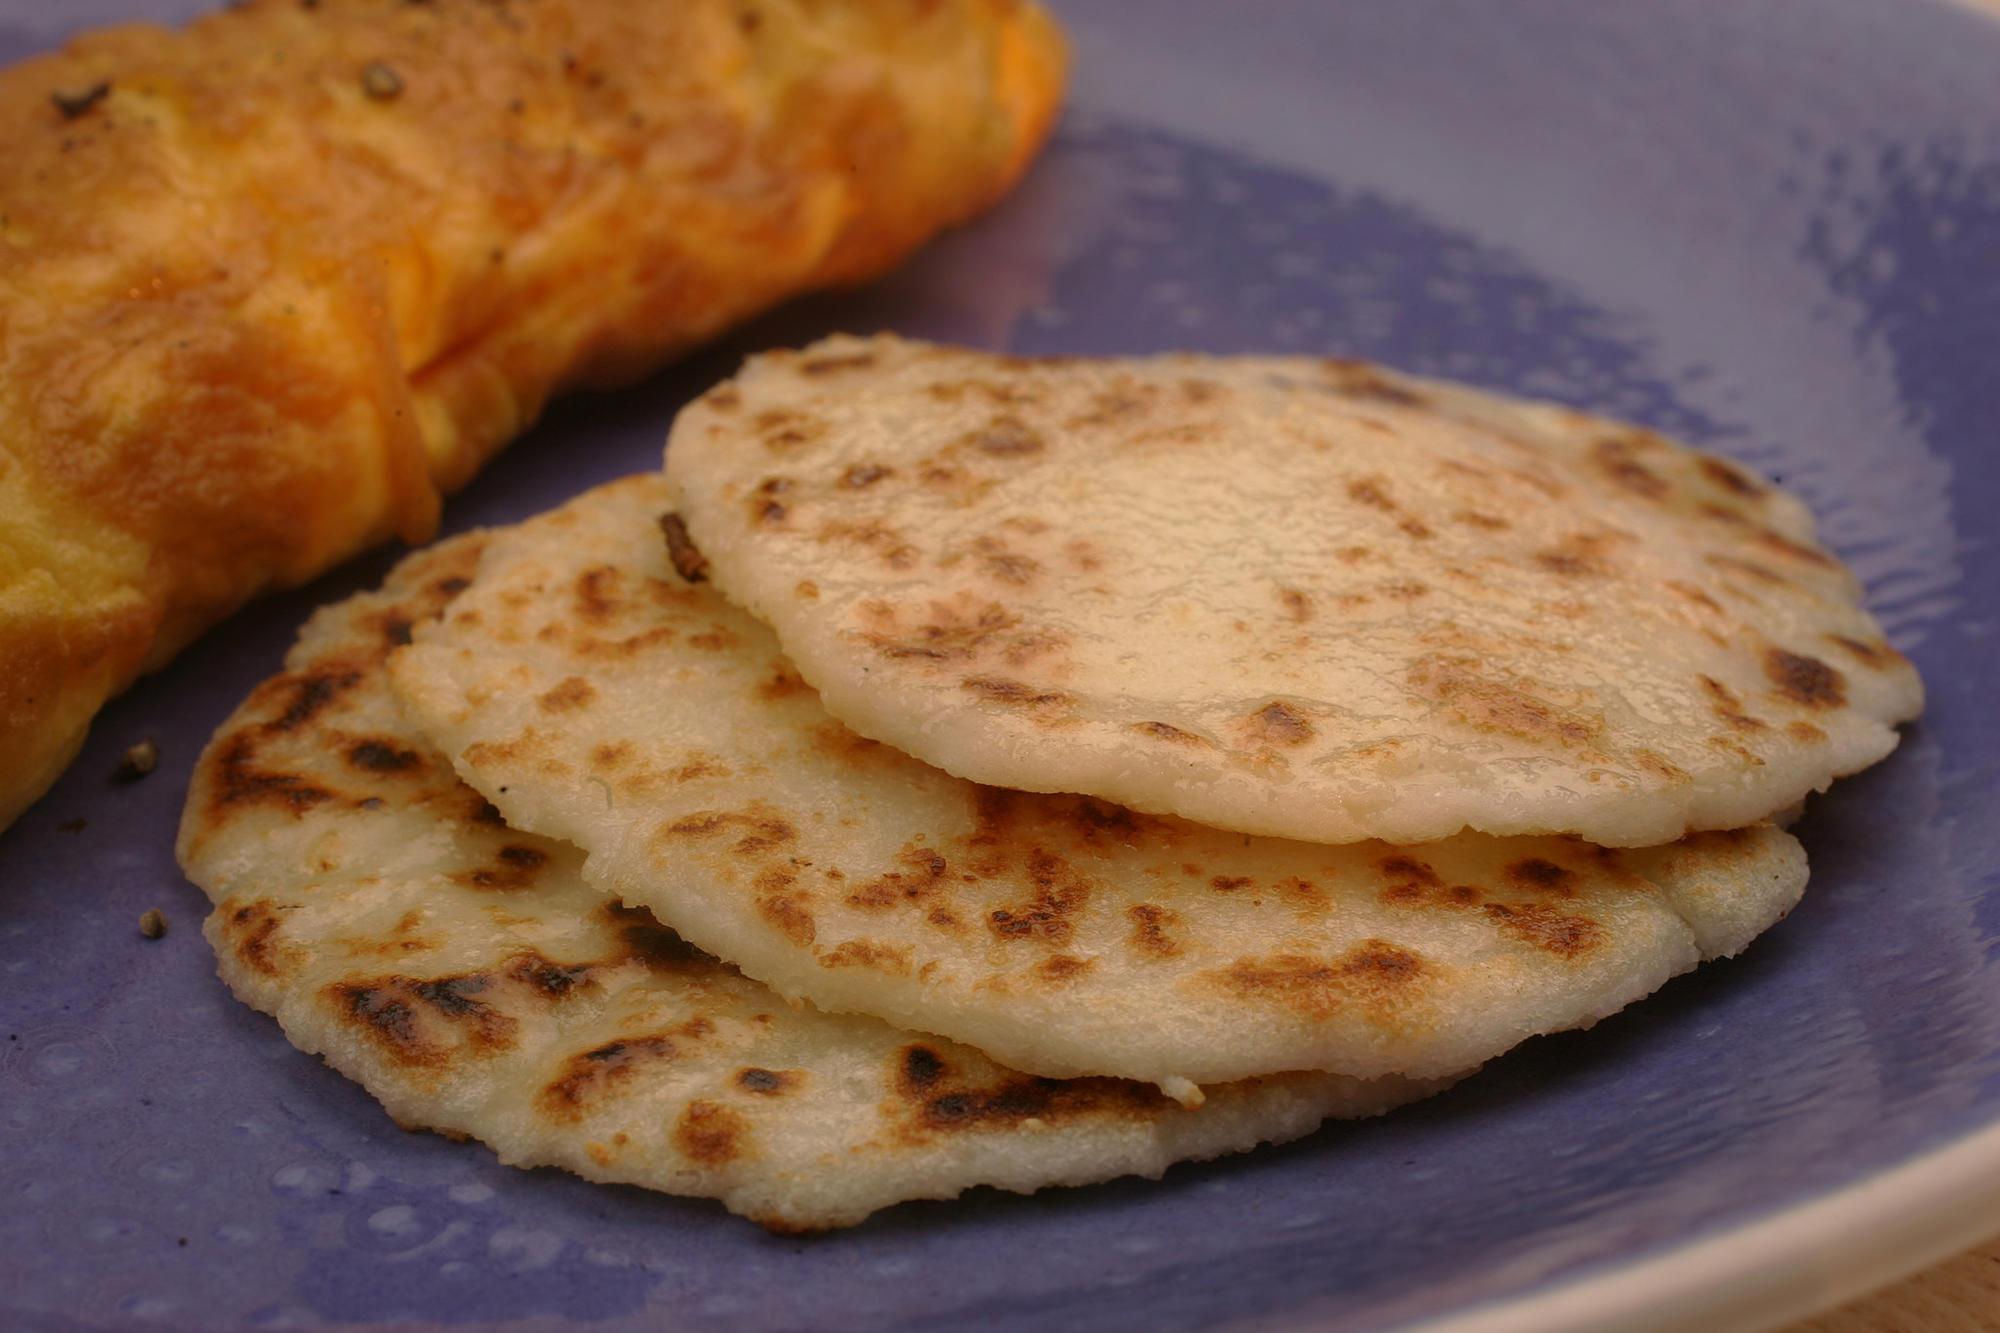 Arepas made of corn flour